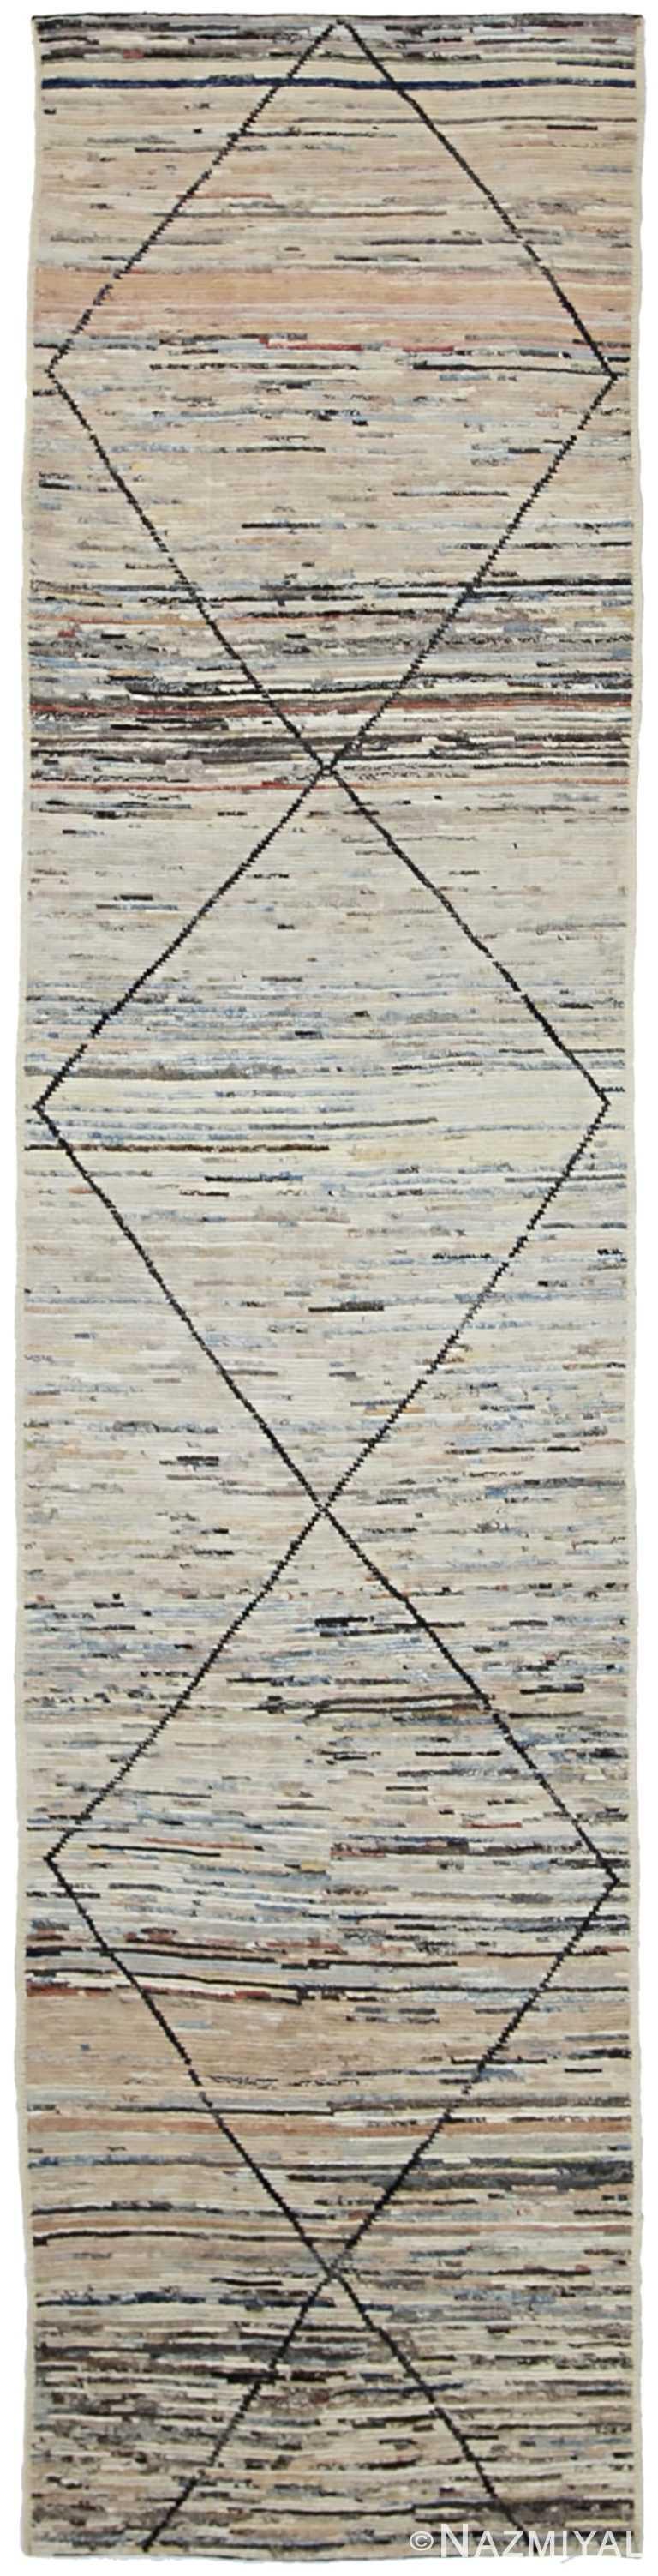 Geometric Beige Modern Moroccan Style Afghan Runner Rug 60152 by Nazmiyal NYC